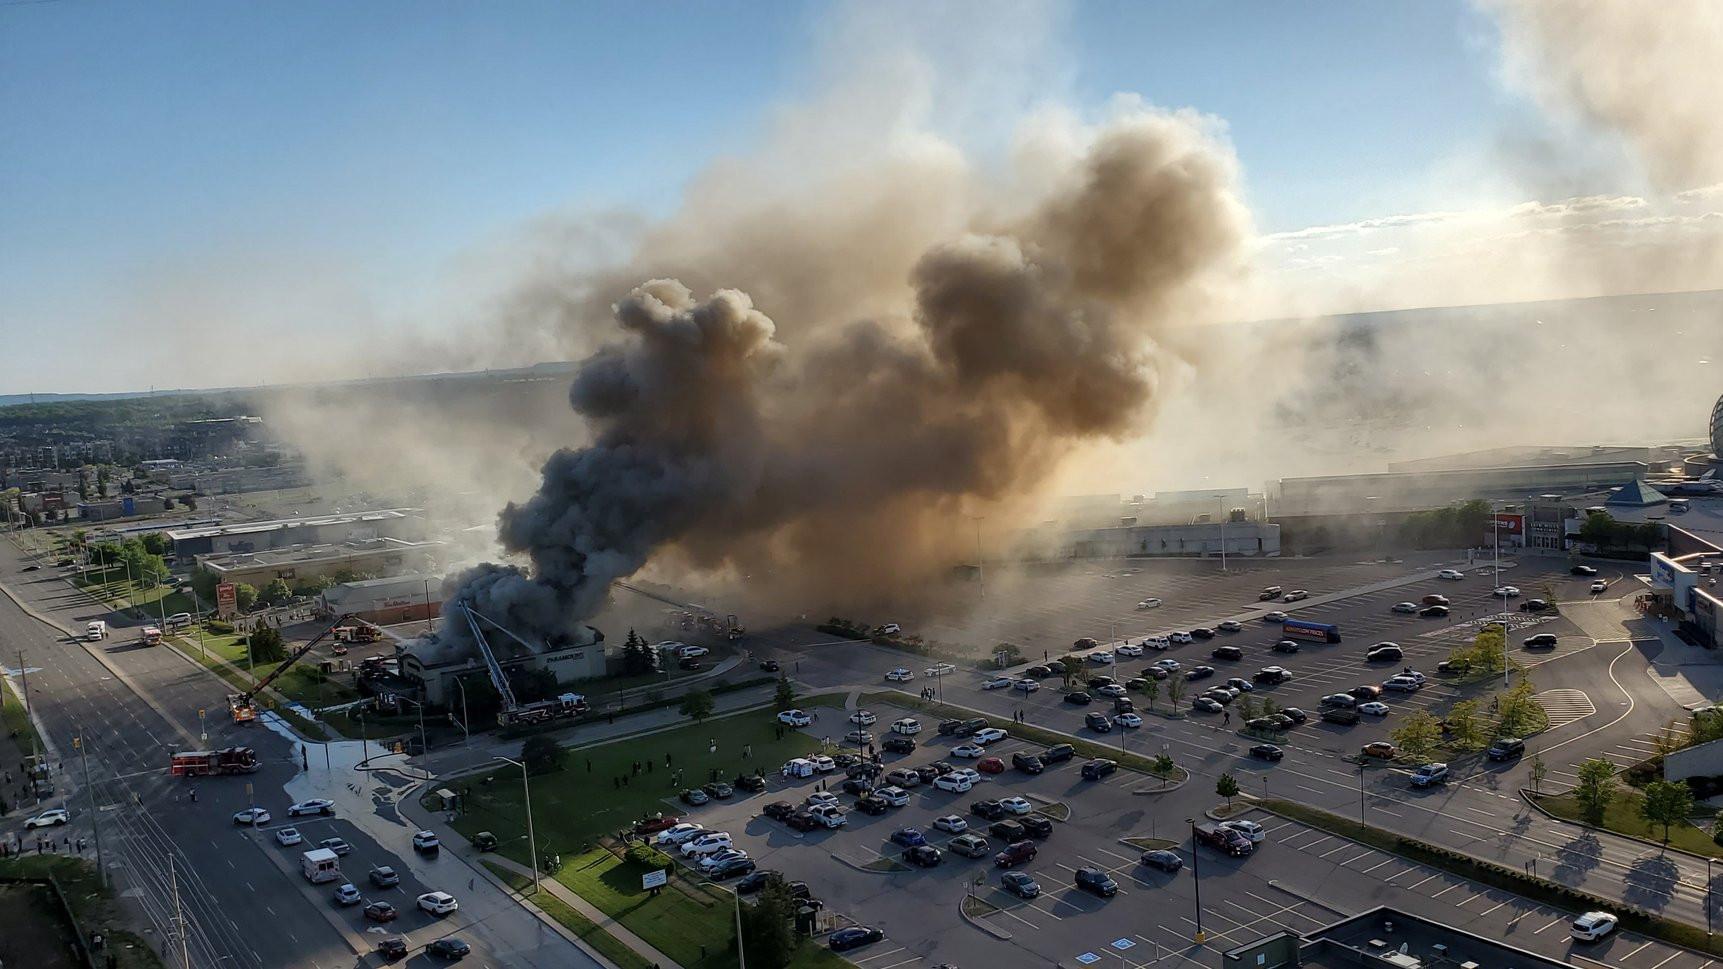 Fire crews battle 2-alarm blaze at Paramount Fine Foods restaurant in Mississauga - CityNews Toronto